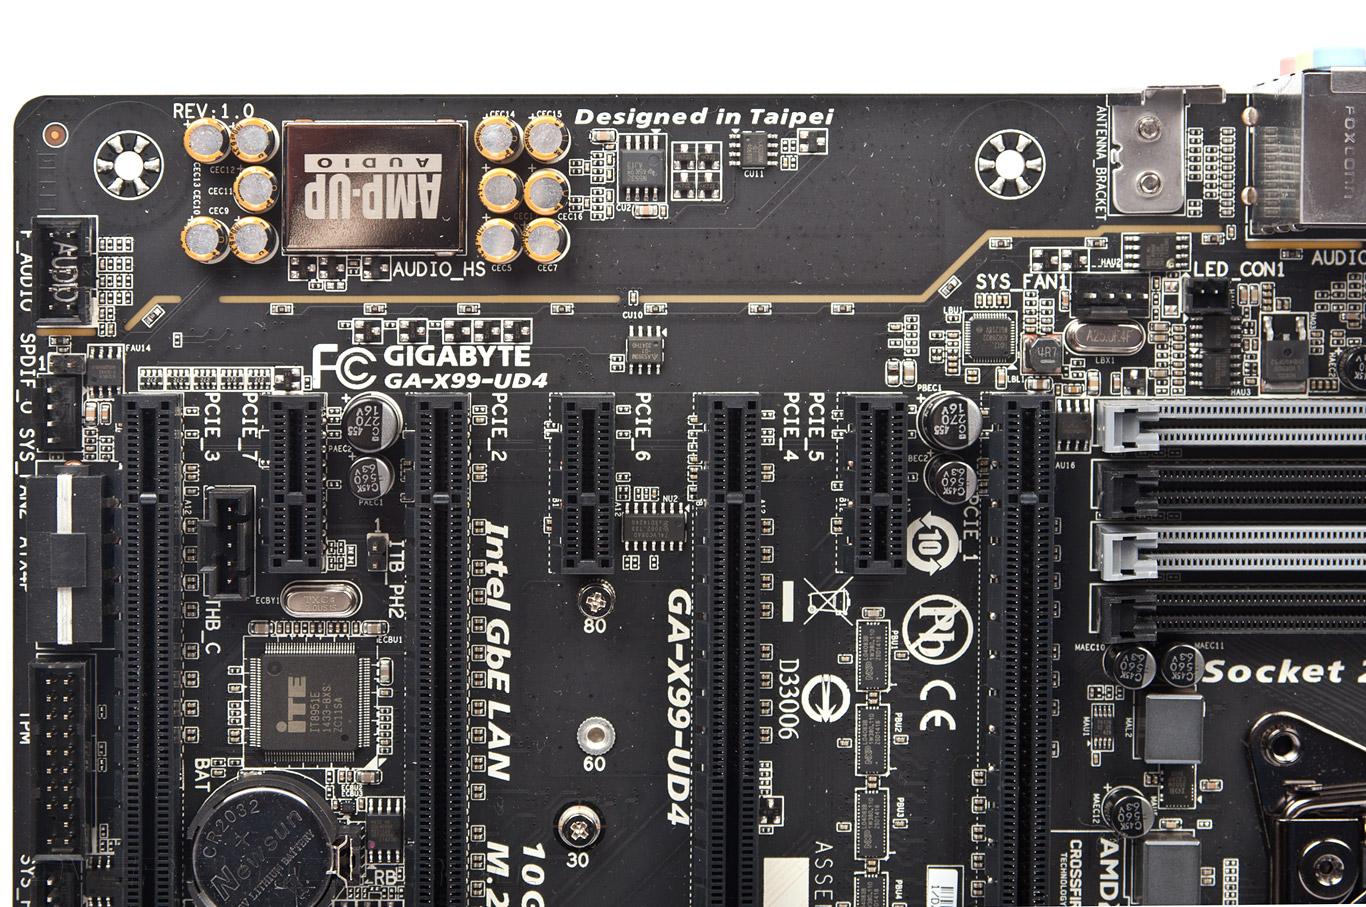 Gigabyte GA-X99-UD4 Intel LAN Driver for Windows Download